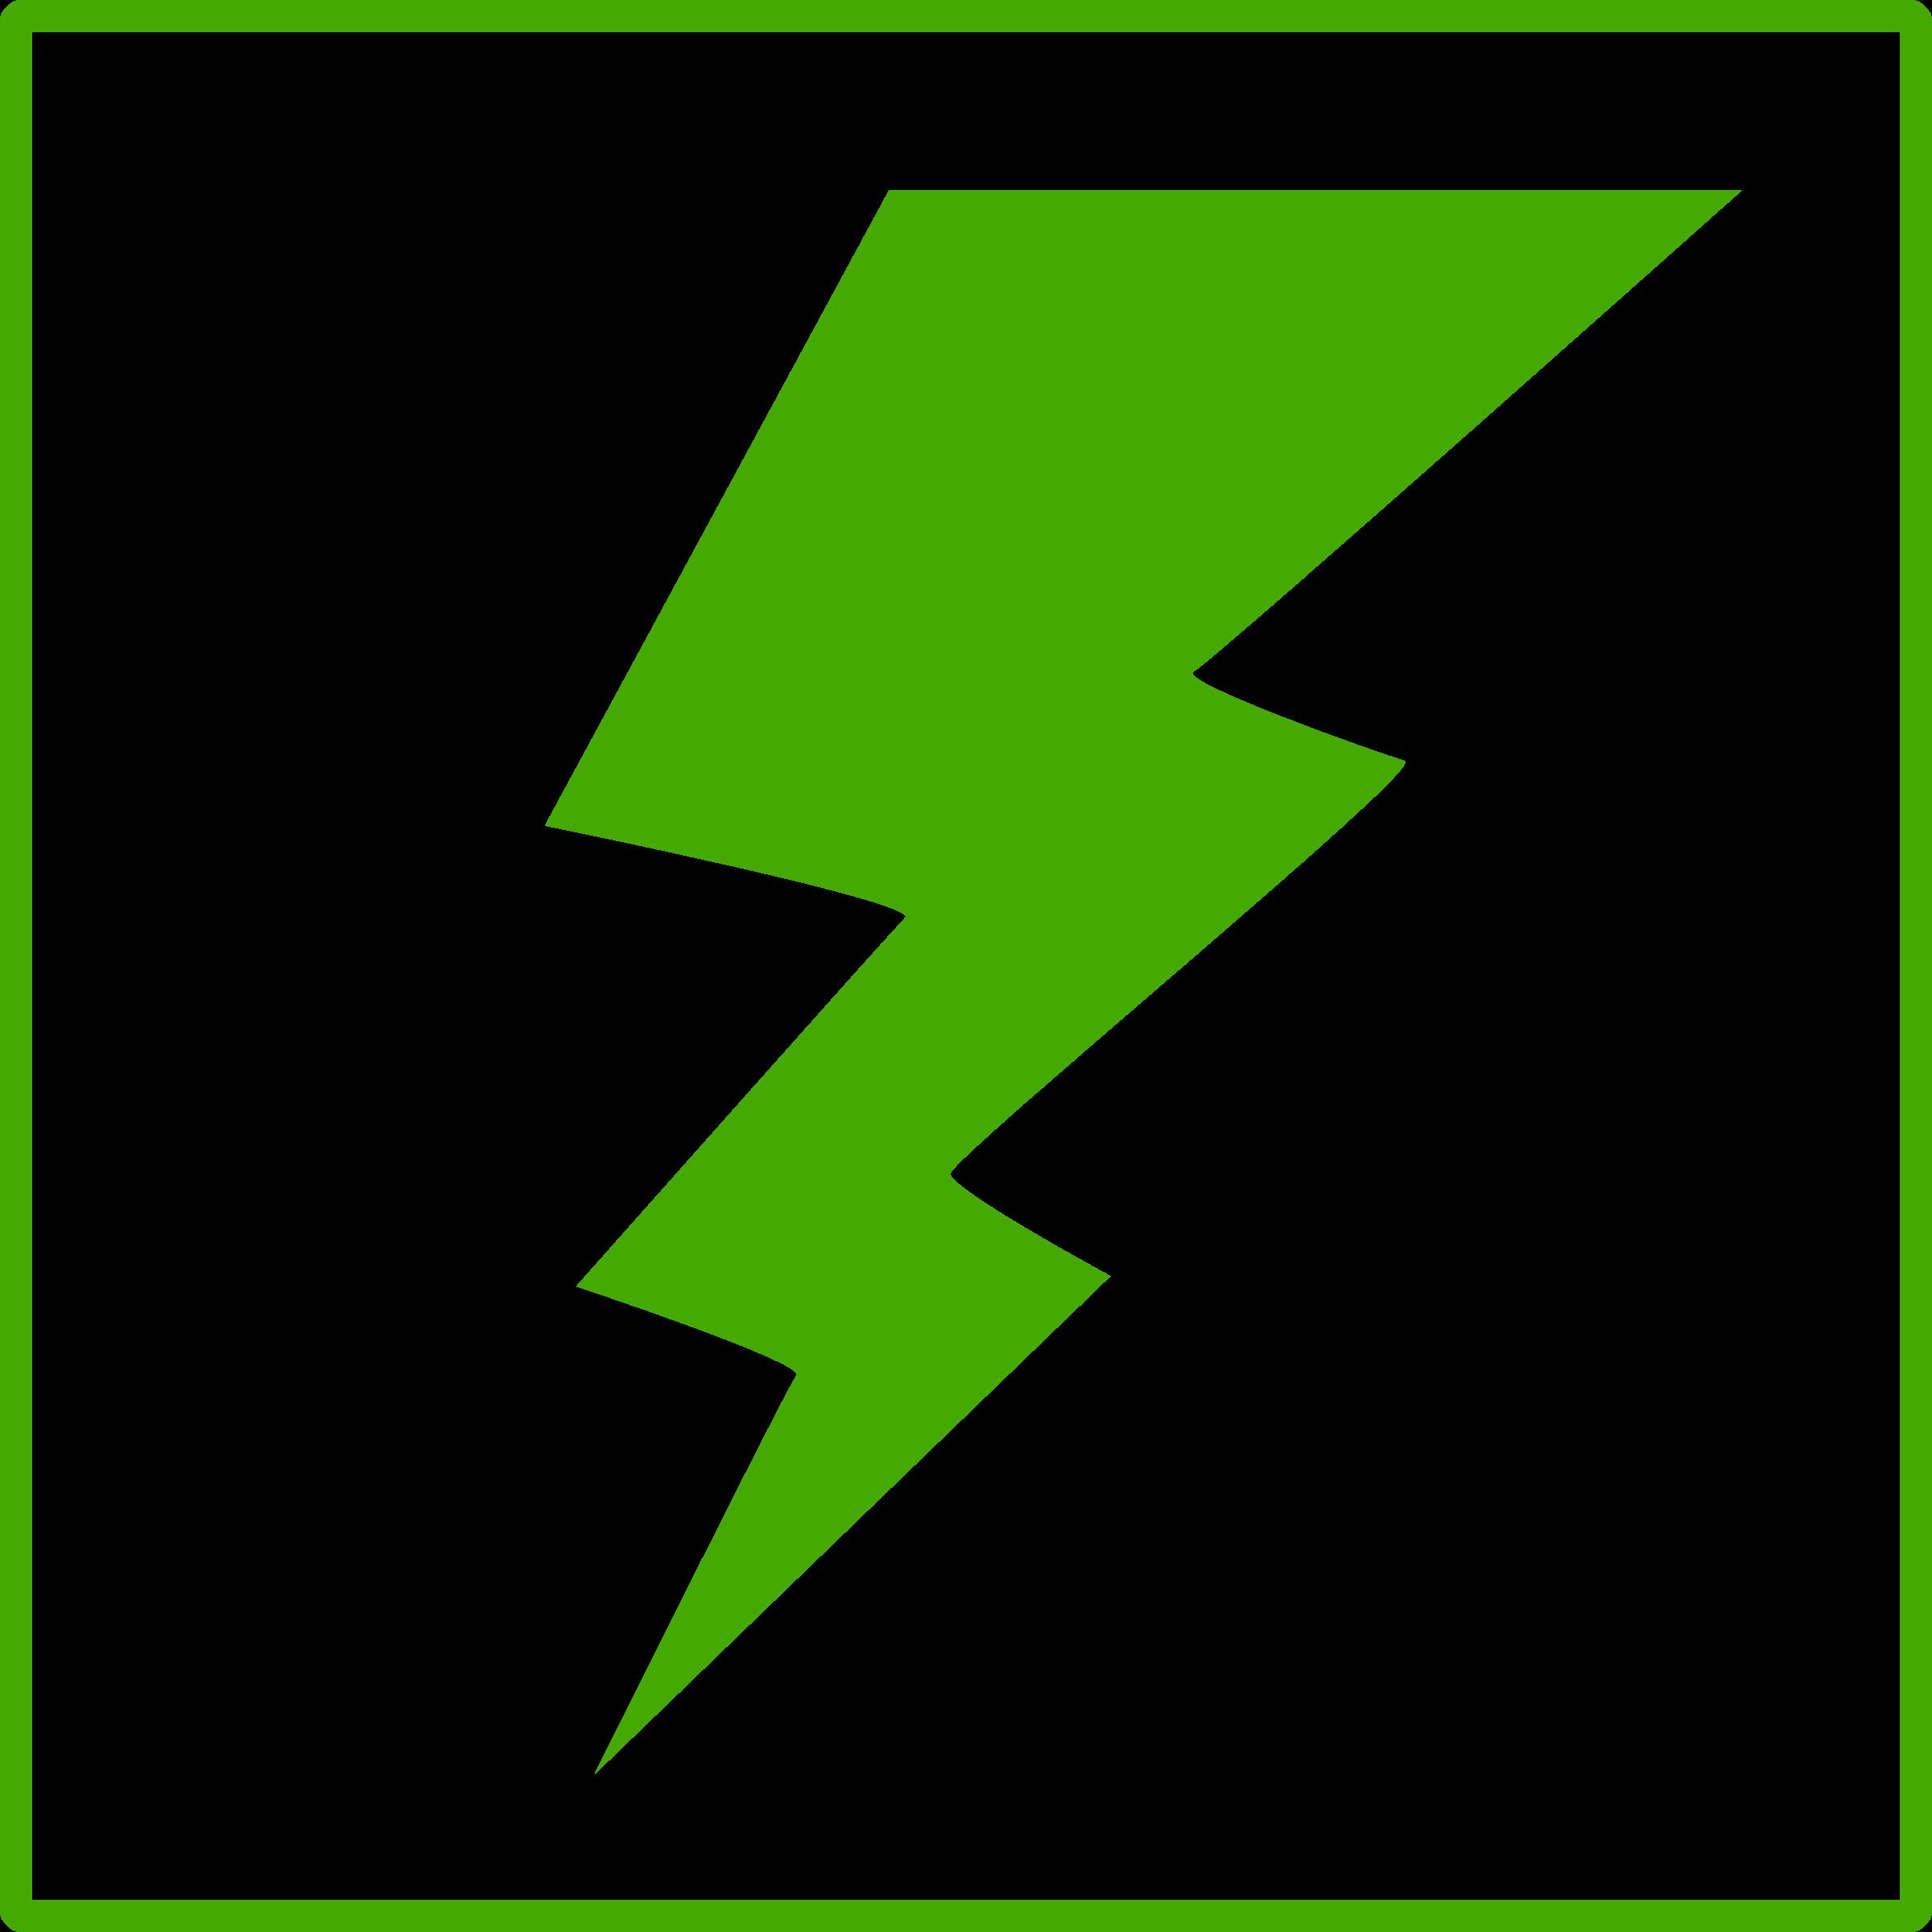 energy clipart icon